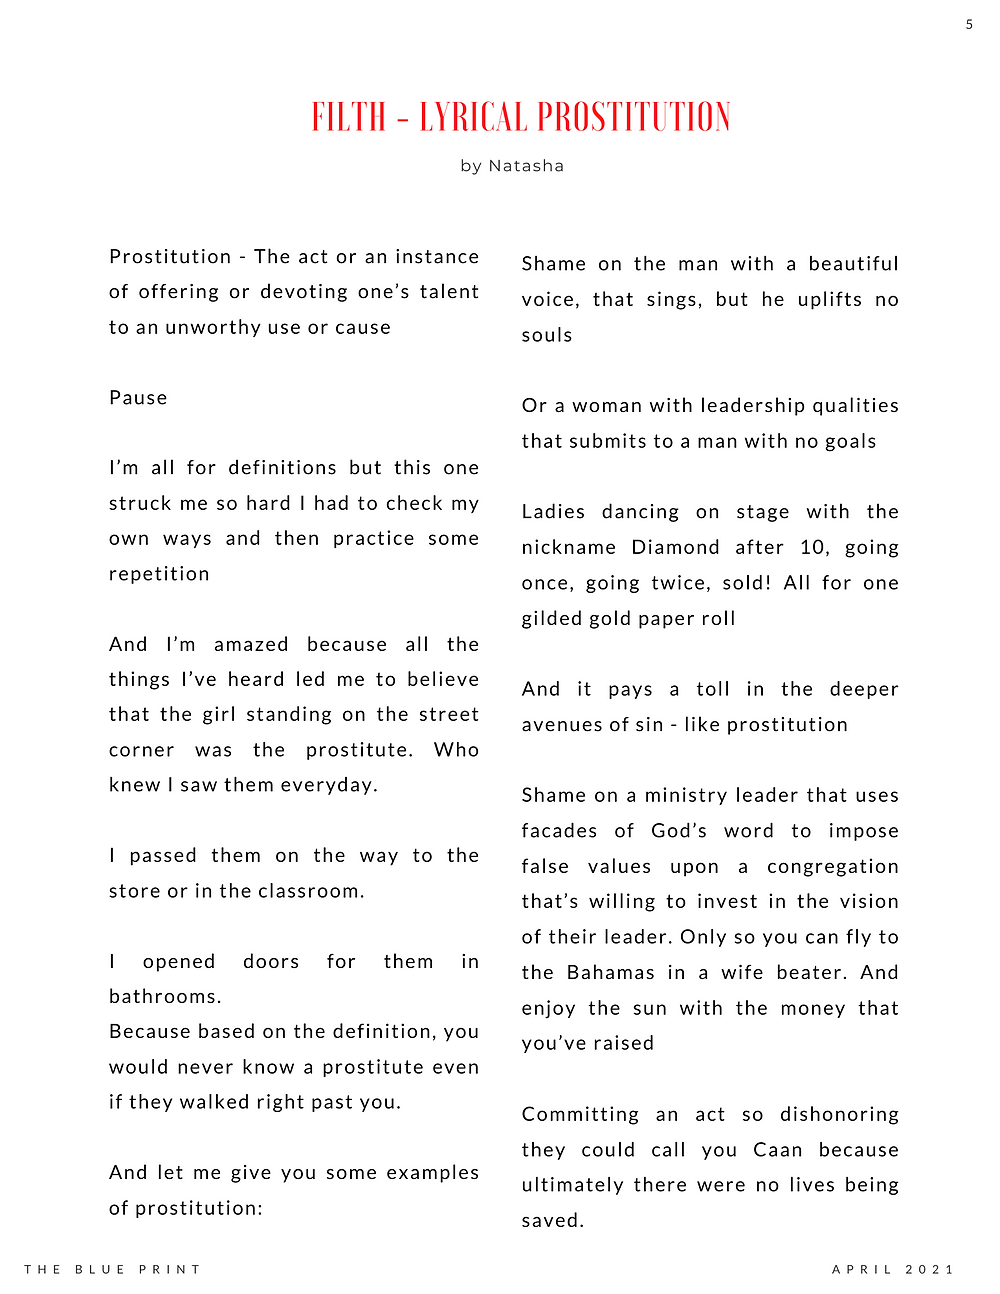 The Blue Print | April 2021 | Filth - Lyrical Prostitution by Natasha